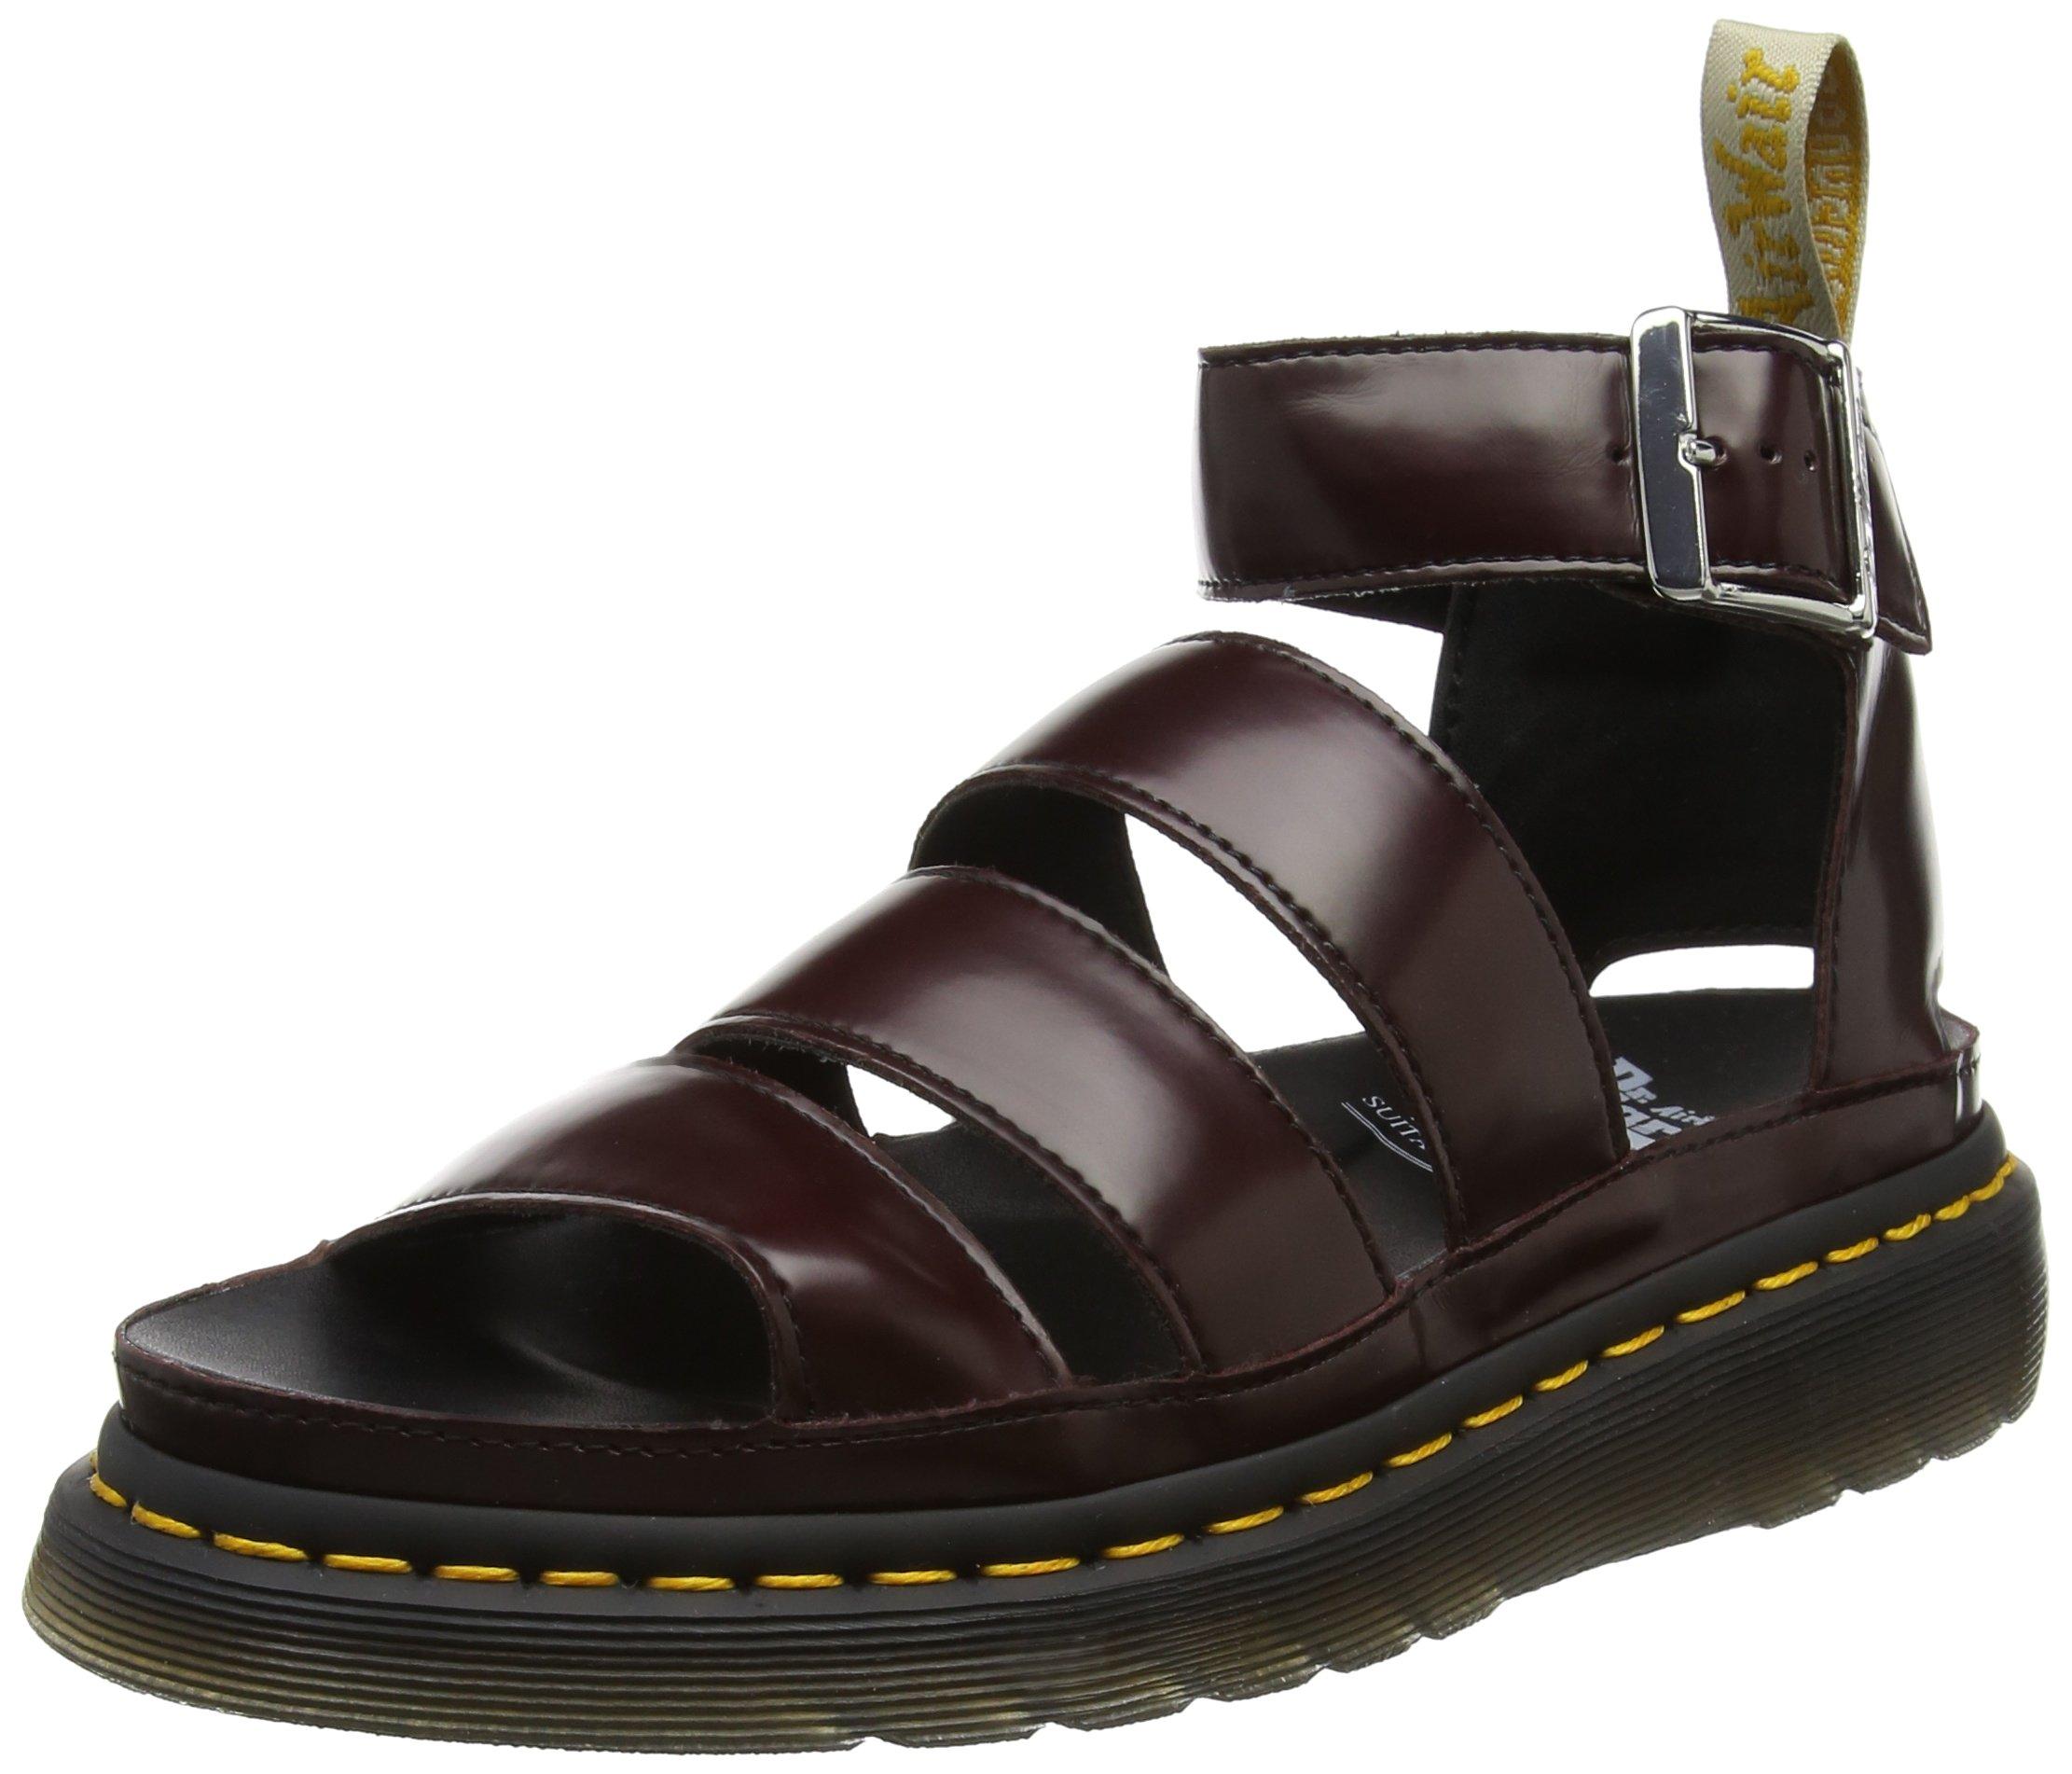 Dr. Martens Women's Vegan Clarissa II Chunky 3 Strap Sandals, Burgundy, Faux Leather, Cotton, 4 M UK, 6 M US